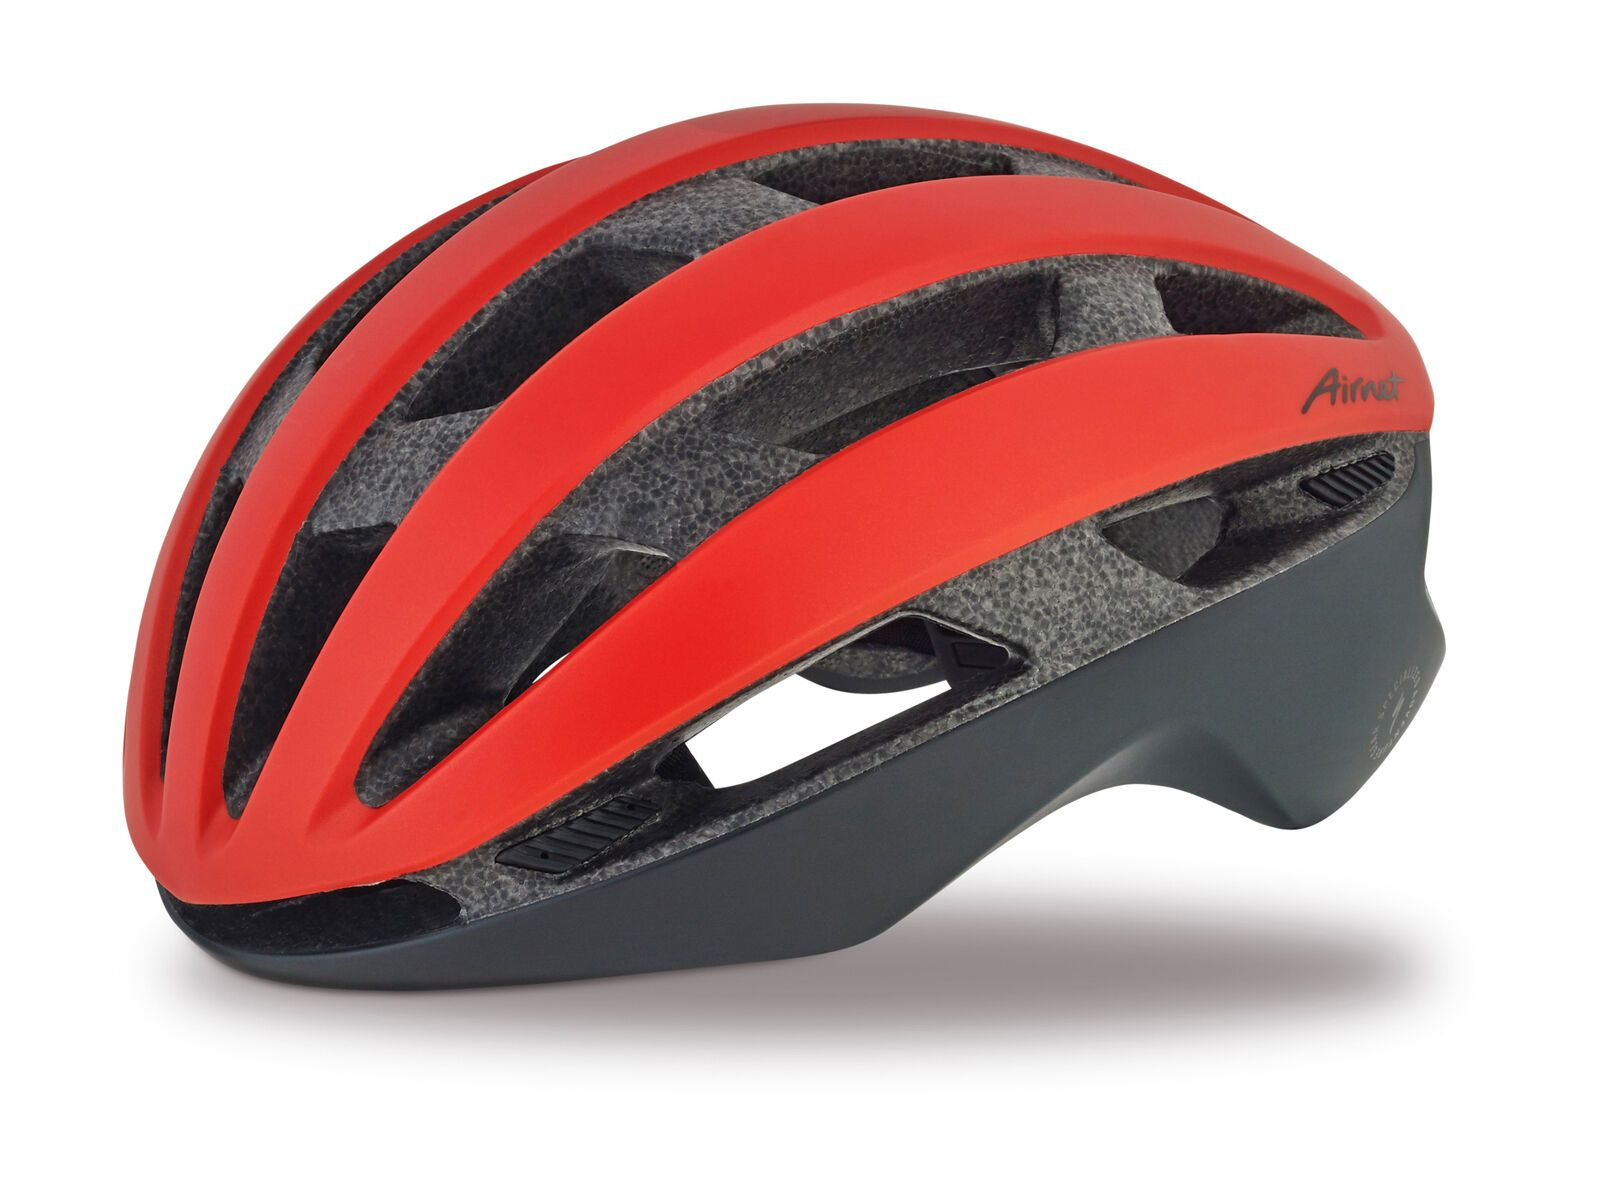 Specialized Airnet, red black - Fahrradhelm, Größe L // 59-63 cm 60117-1614